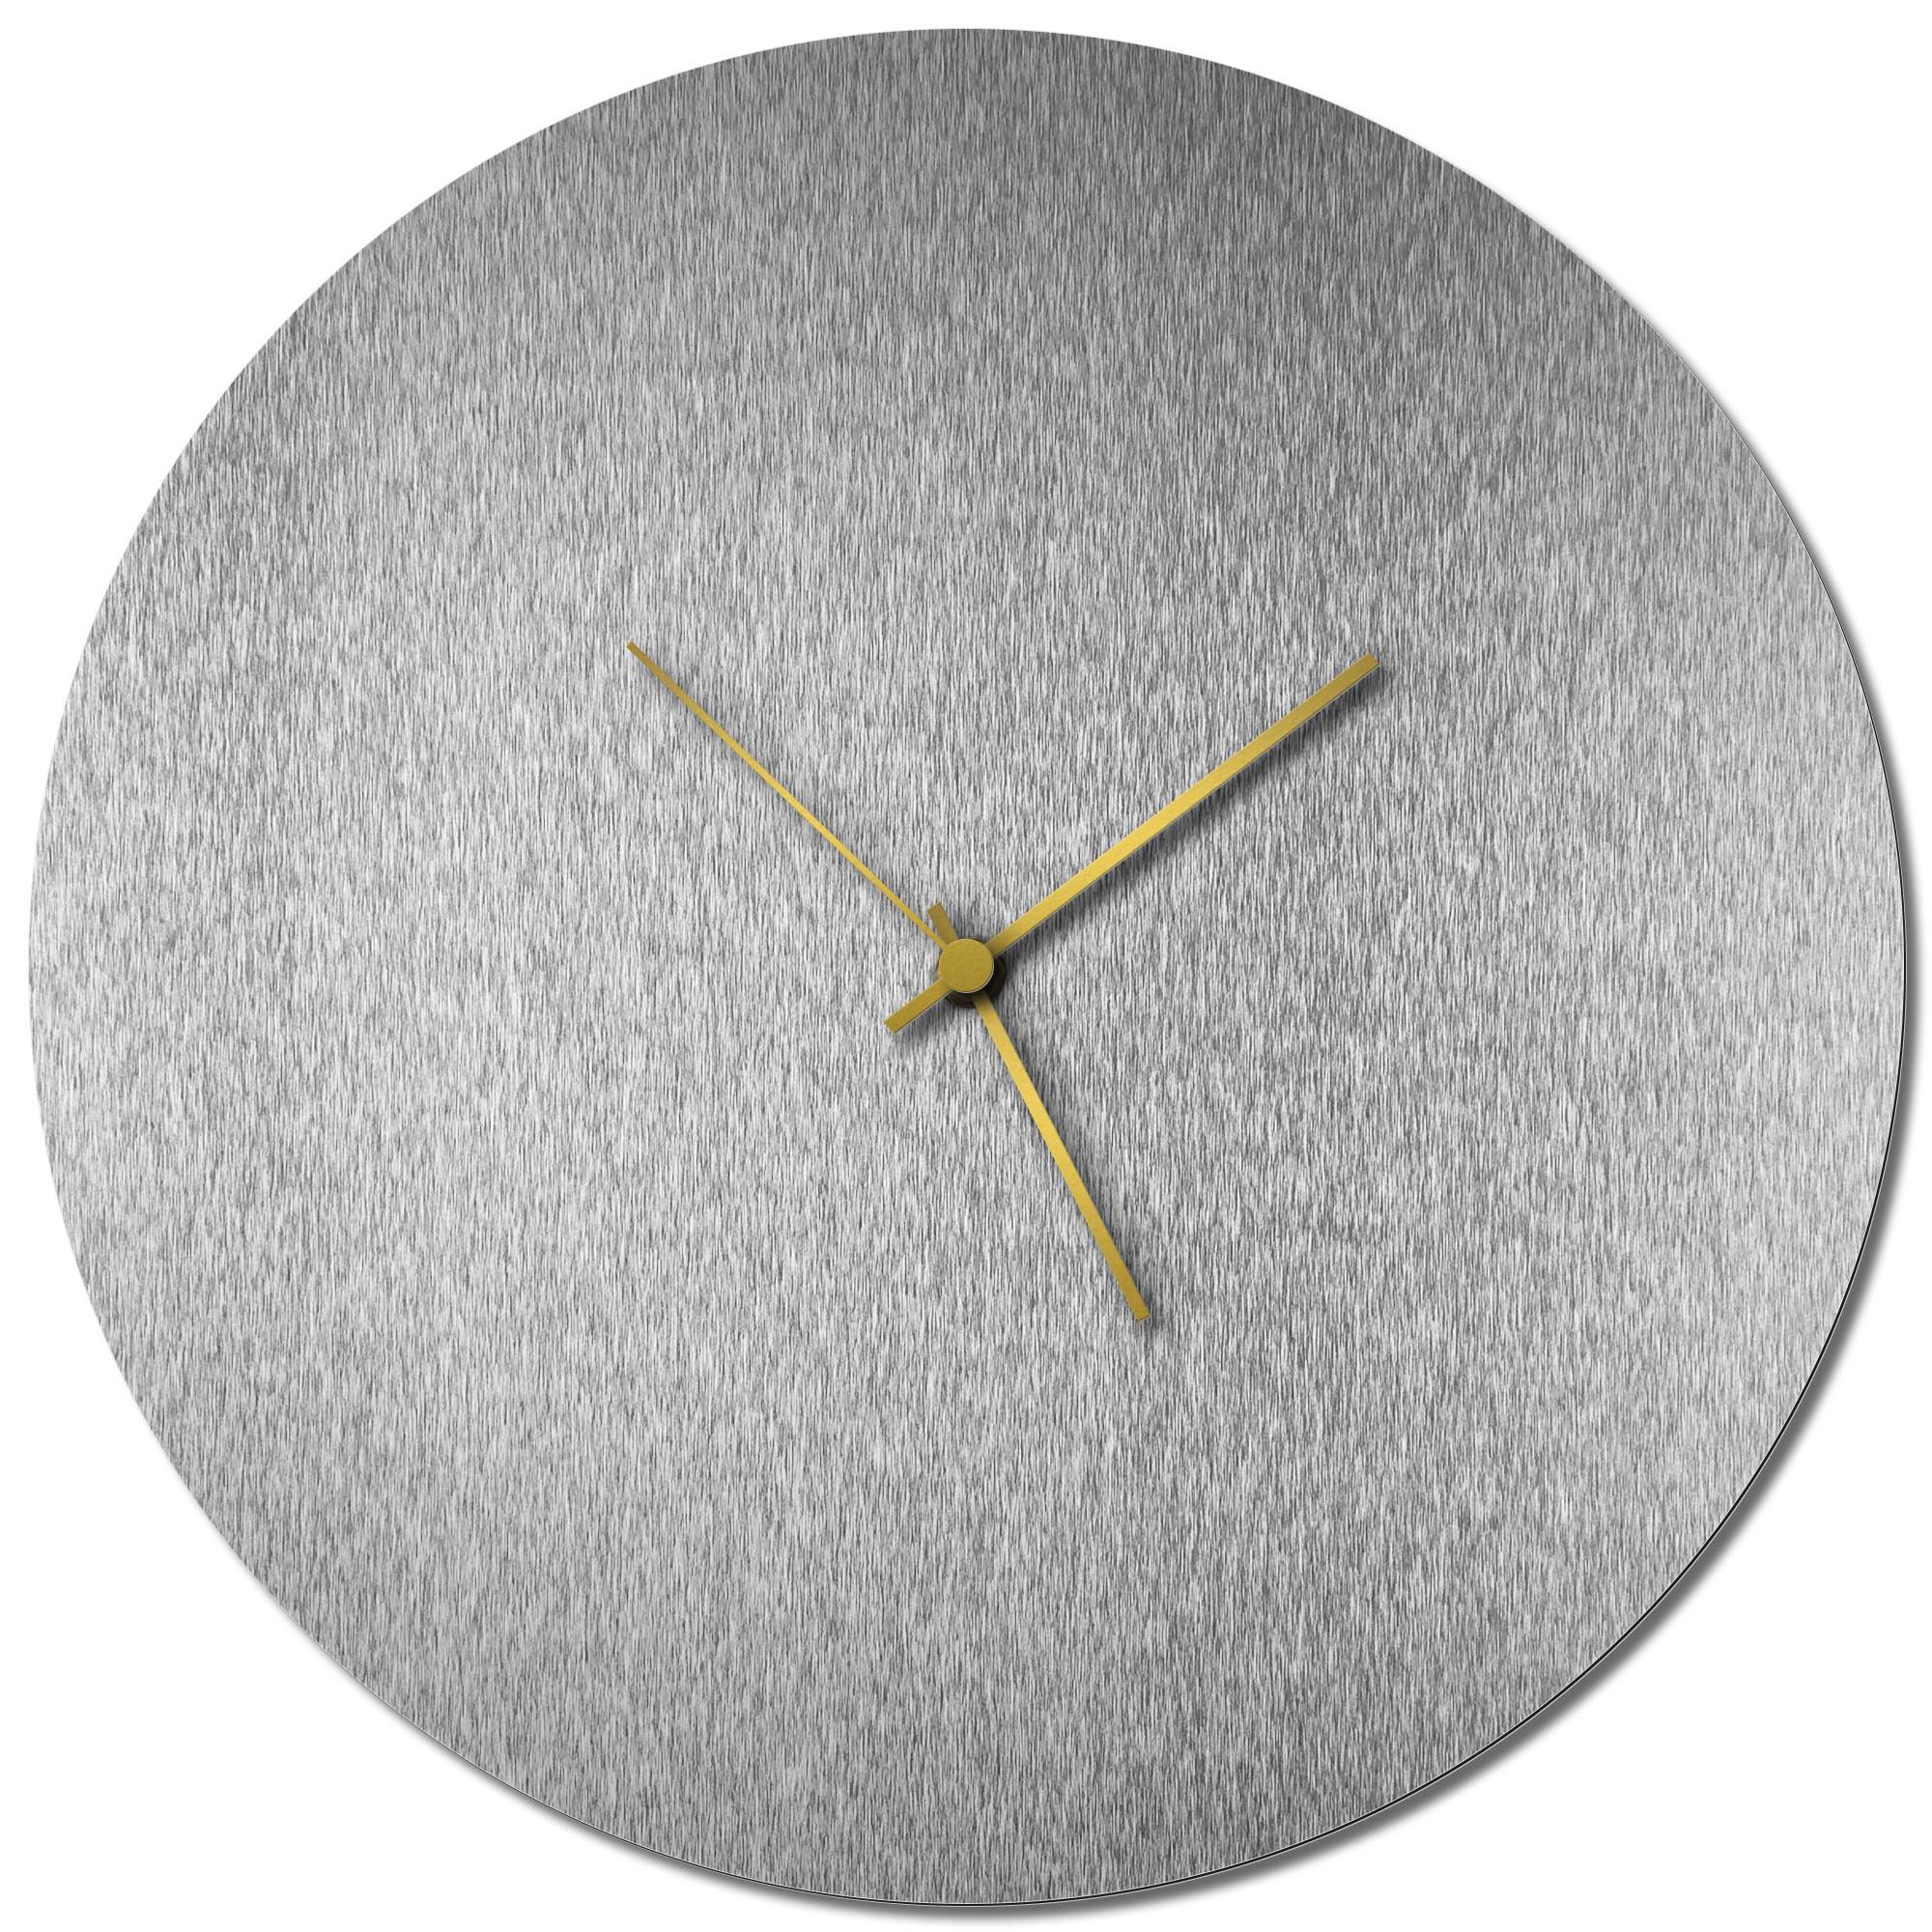 Adam Schwoeppe 'Silversmith Circle Clock Gold' Midcentury Modern Style Wall Clock